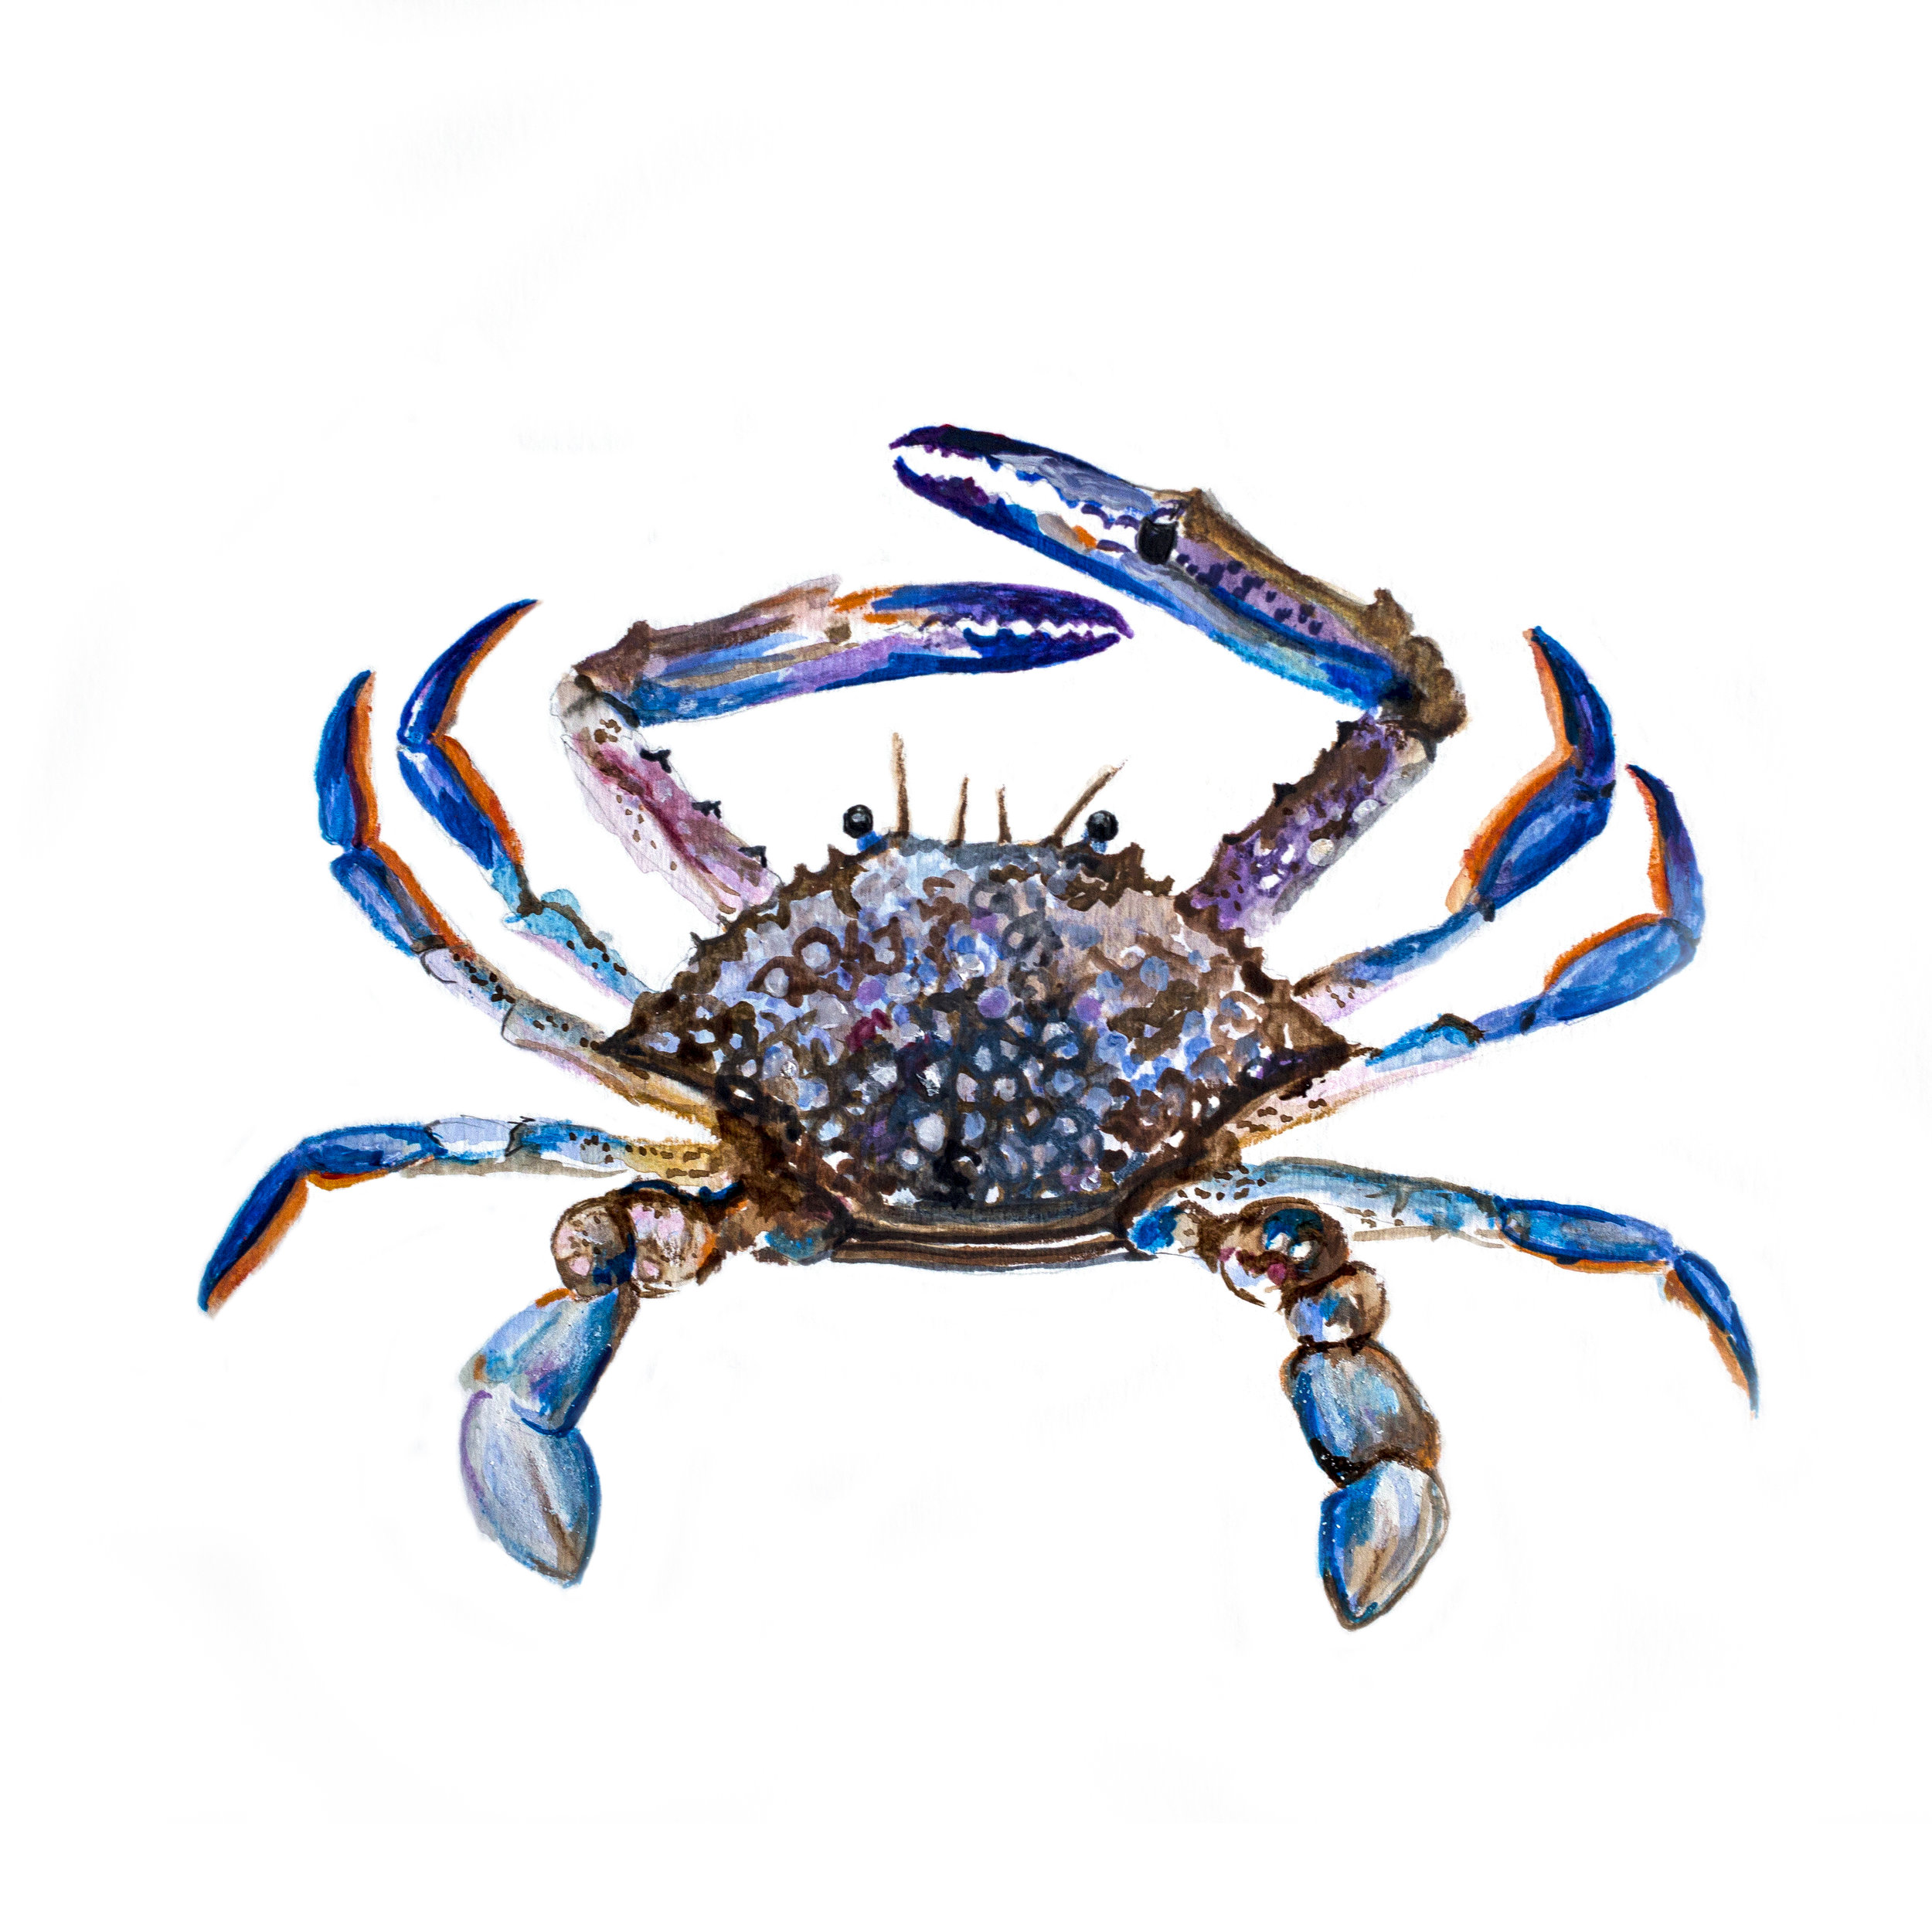 Blue swimmer crab.jpg